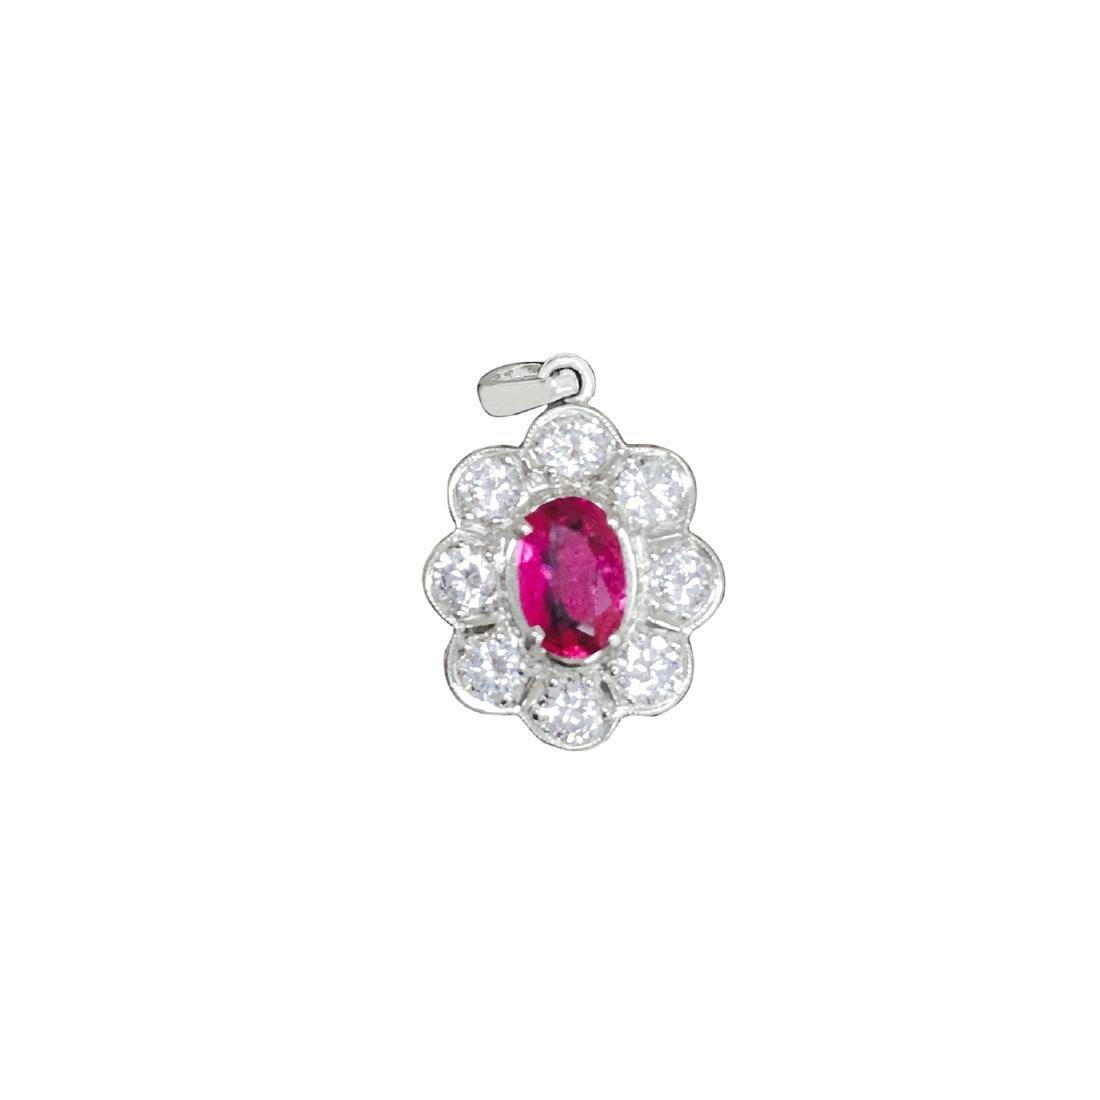 18K White Gold, No Heat Ruby and White Diamond Pendant